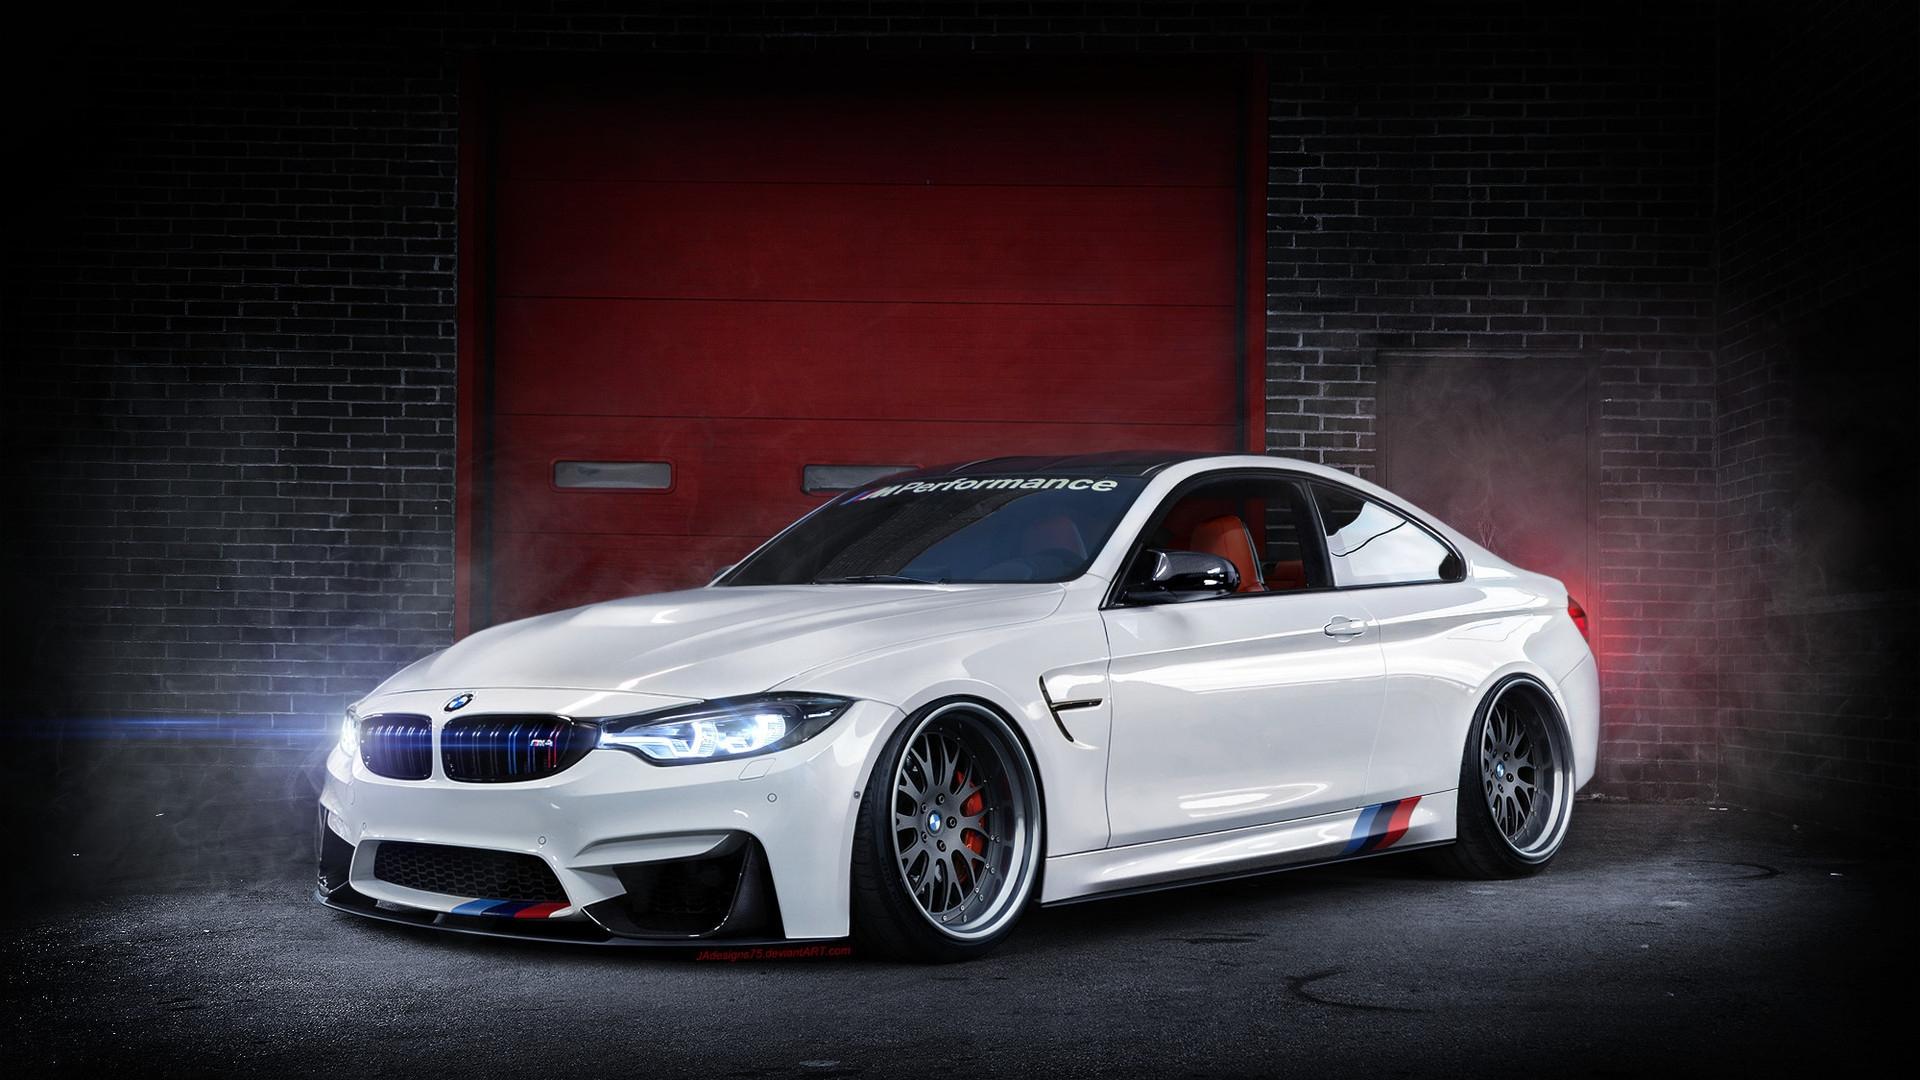 A beautiful white BMW F82 M4 in a garage Wallpaper ...